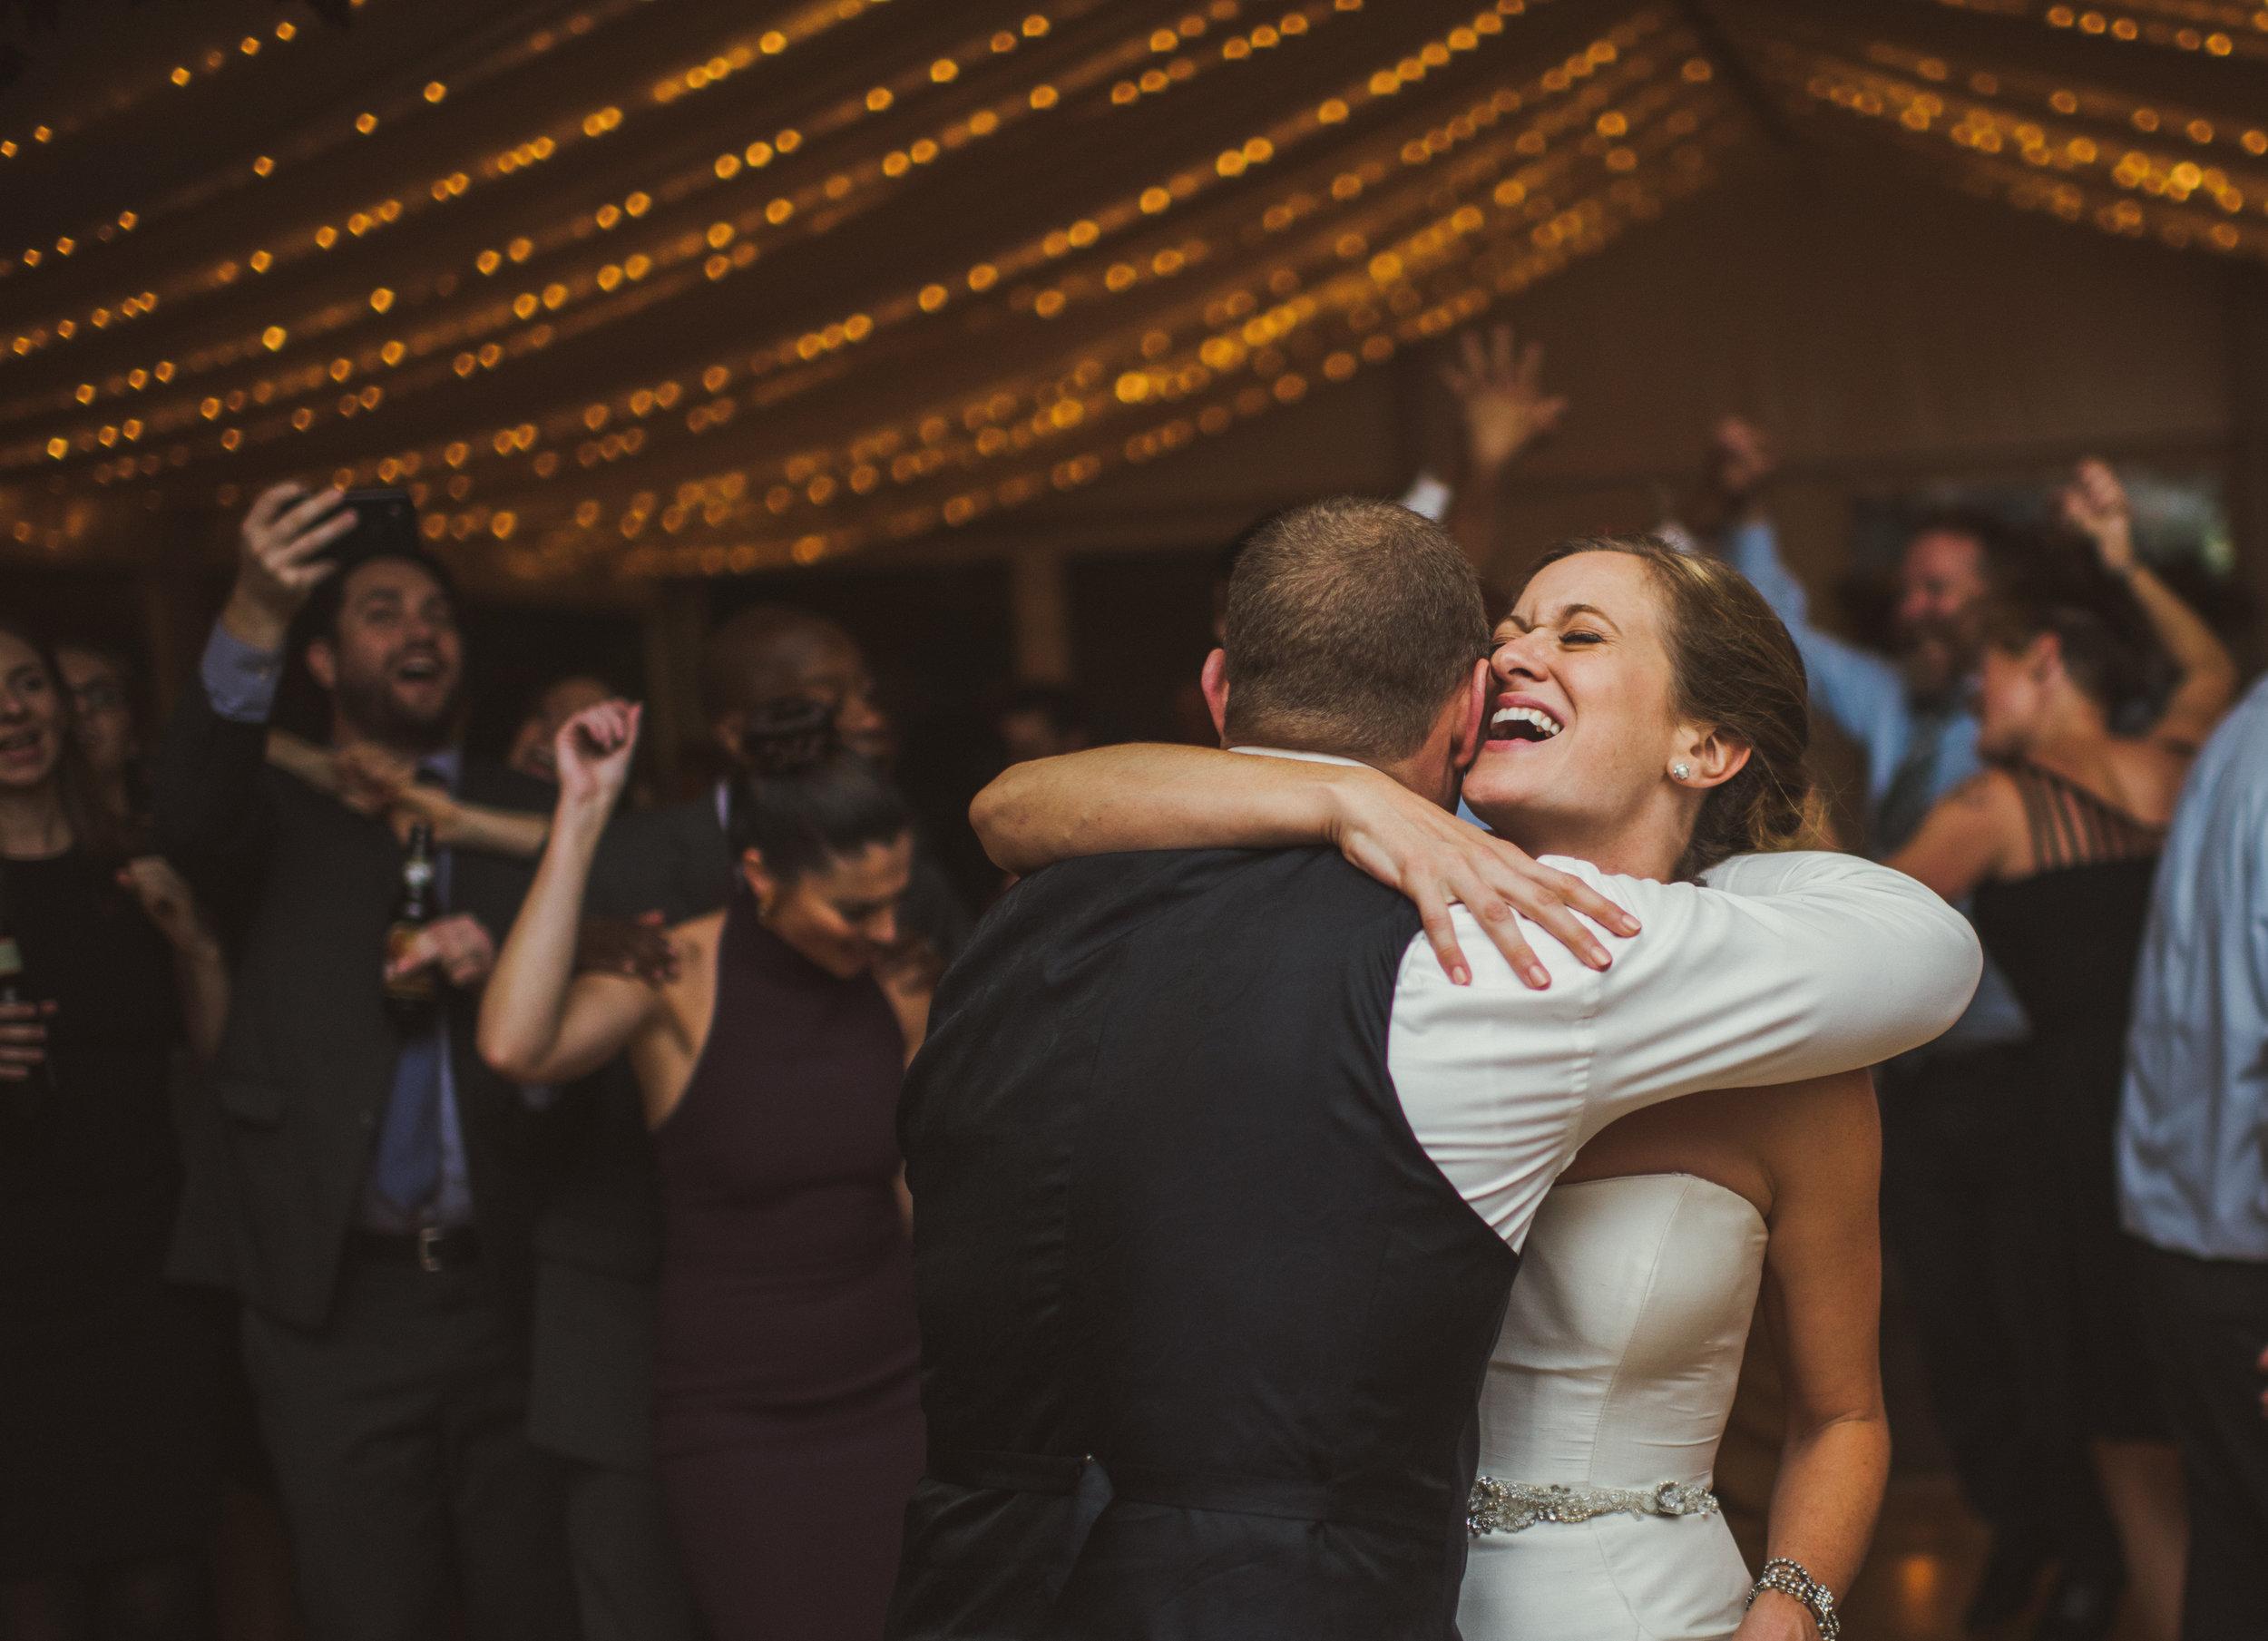 JACQUELINE & ANDREW WARSHAWER -BROOKMILL FARM FALL WEDDING - INTIMATE WEDDING PHOTOGRAPHER - TWOTWENTY by CHI-CHI AGBIM-814.jpg